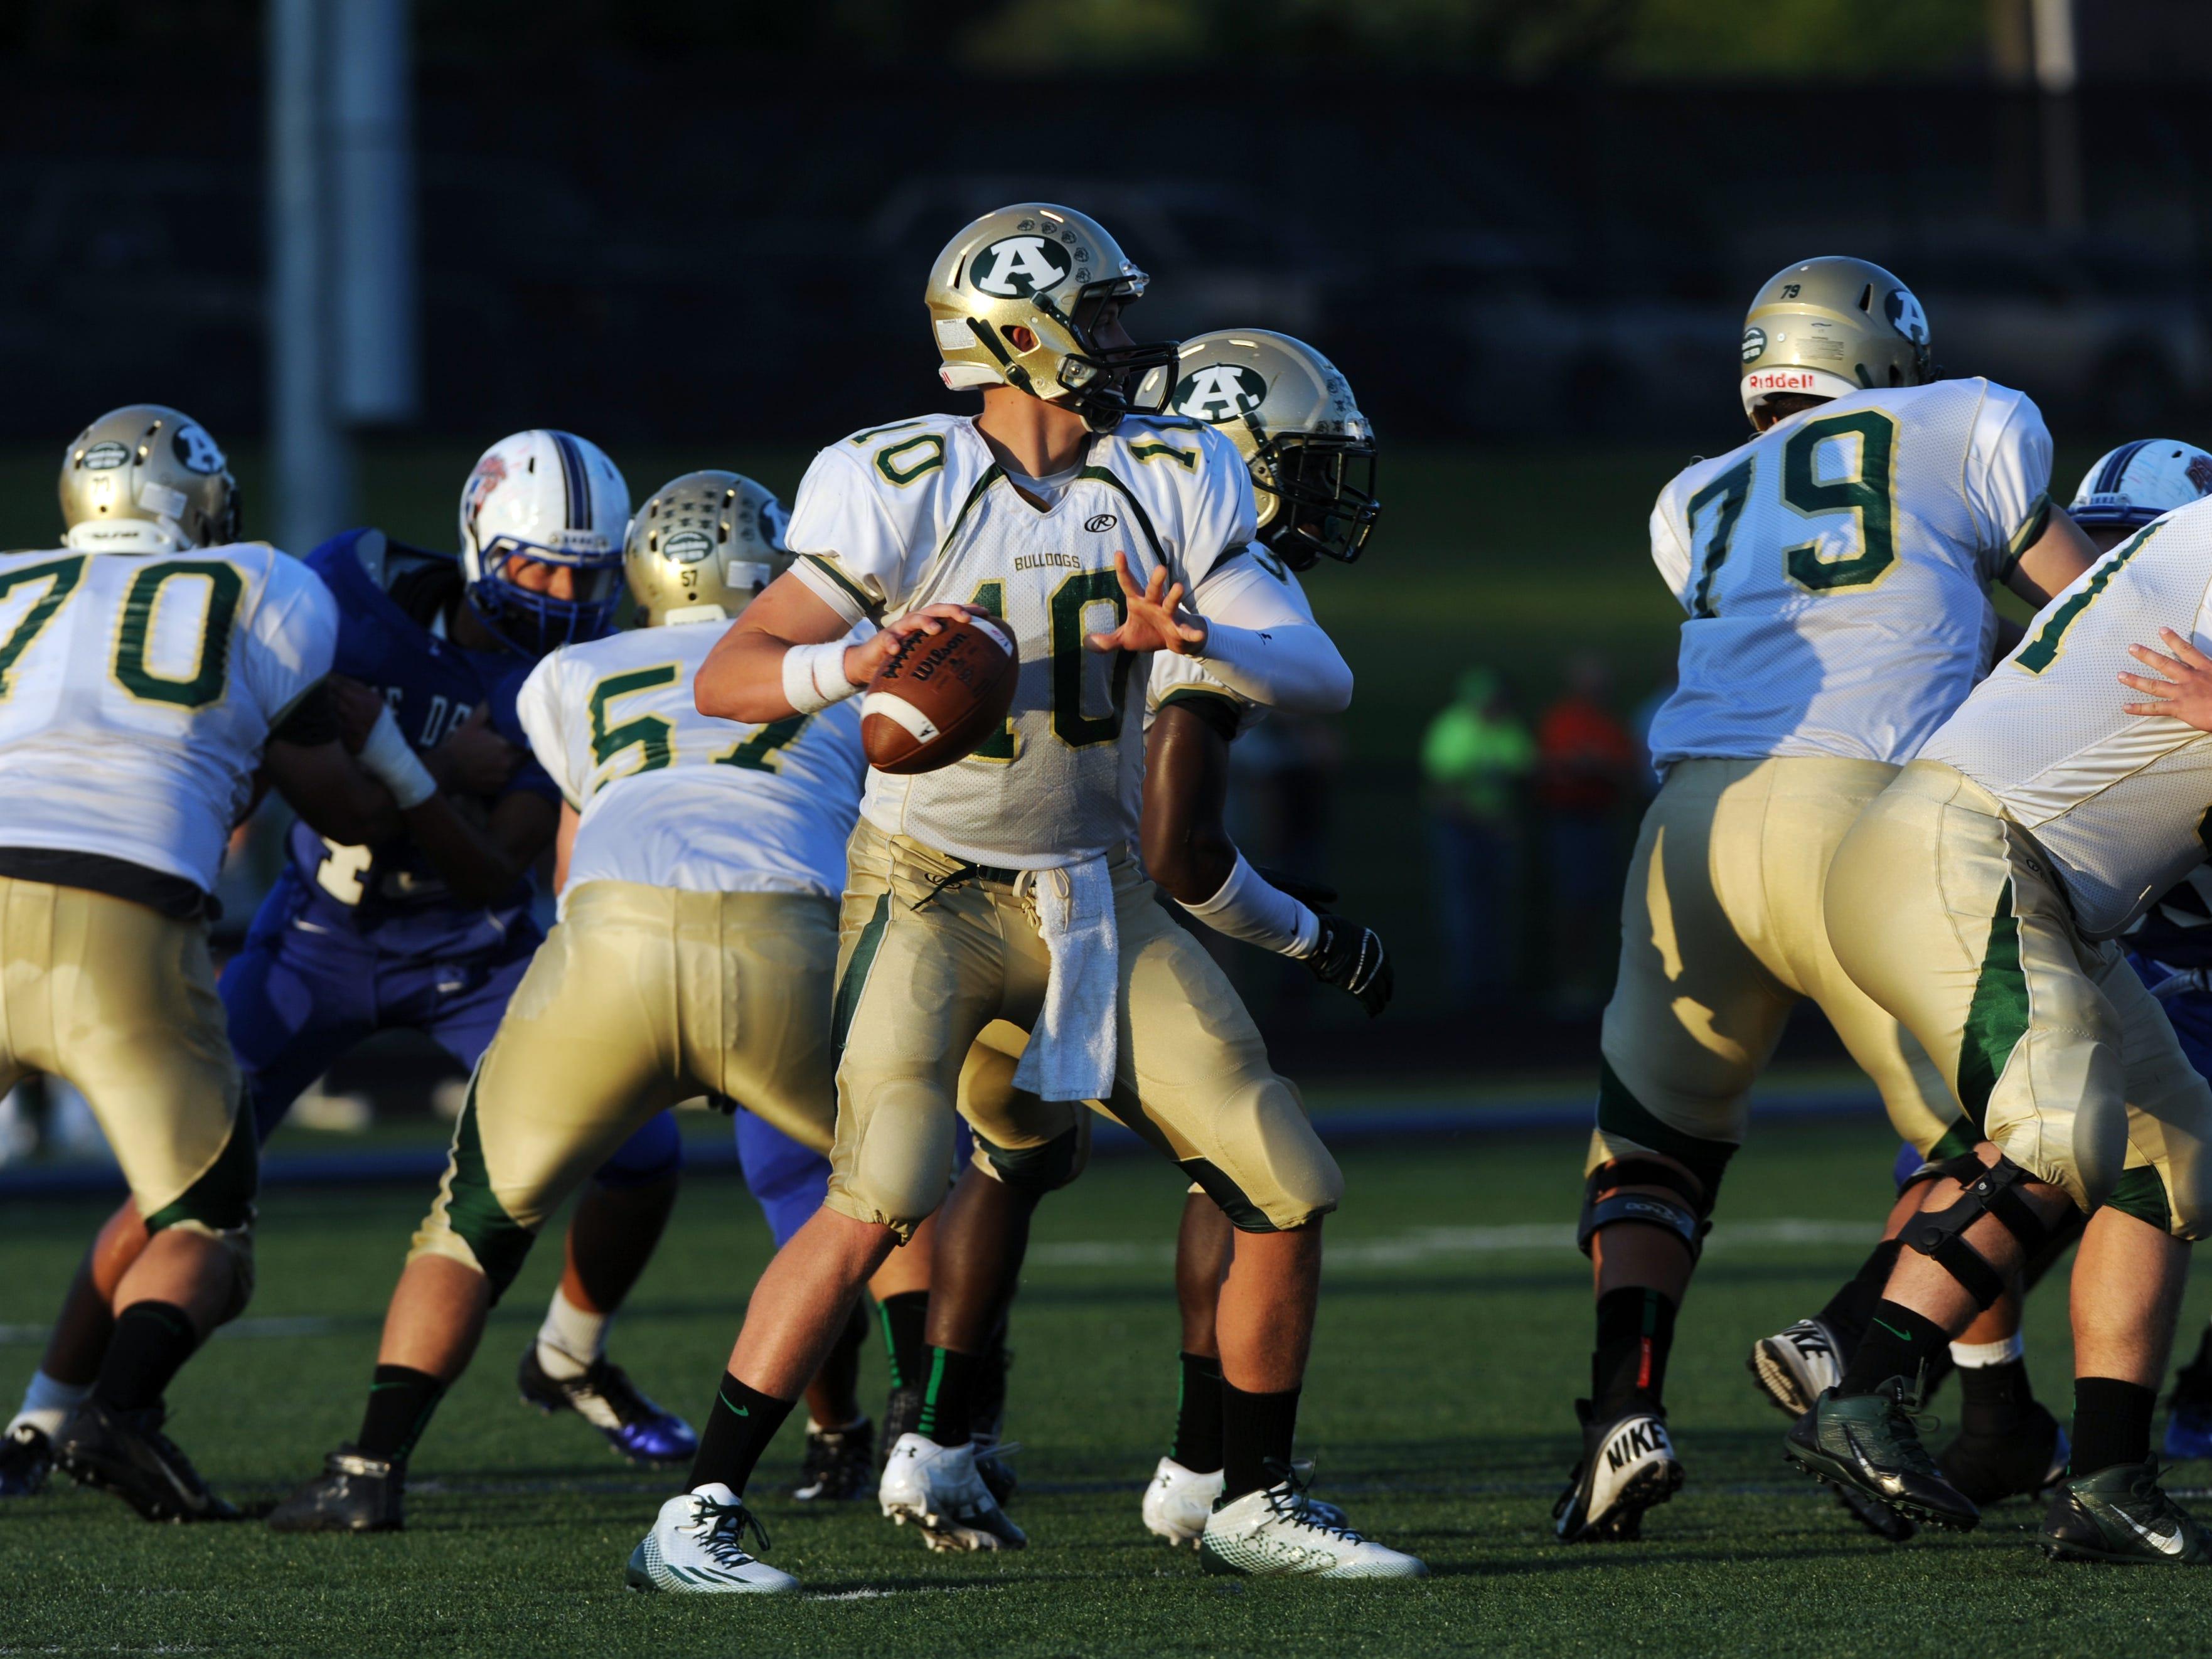 Athens' Joe Burrow, an OSU recruit, readies a throw against Zanesville.